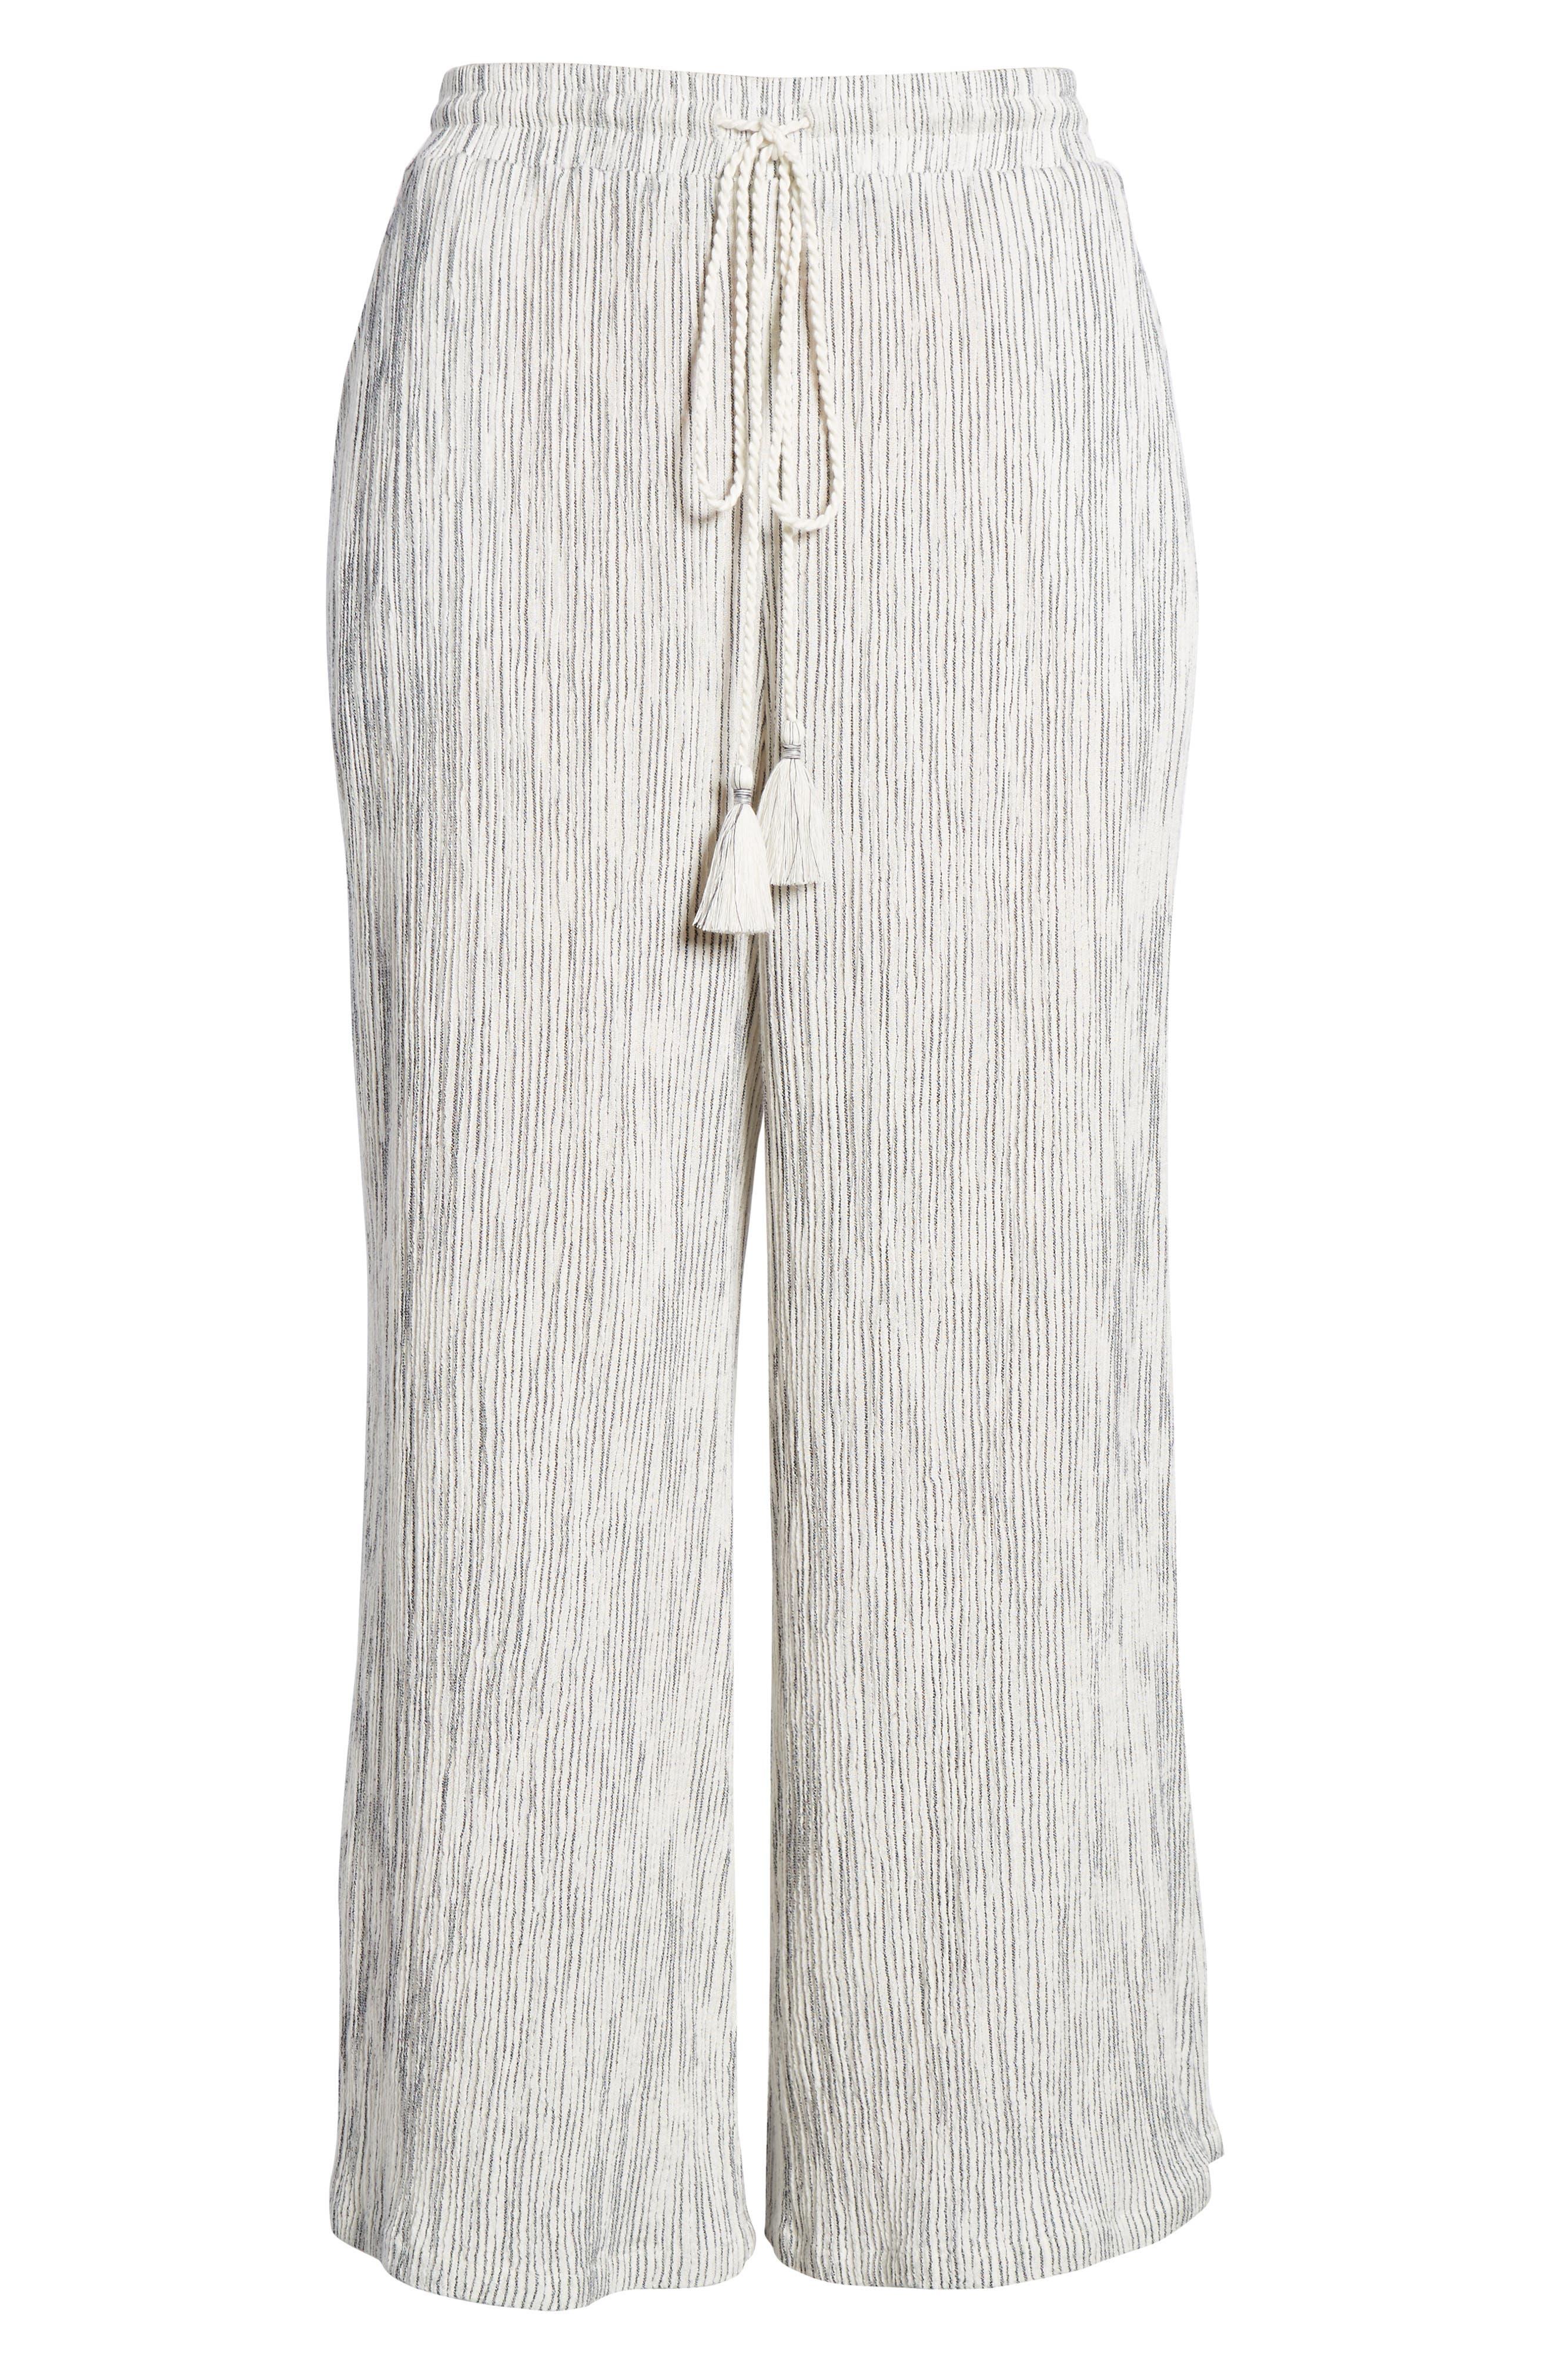 Crinkled Wide Leg Crop Pants,                             Alternate thumbnail 7, color,                             Ivory Angel Stripe